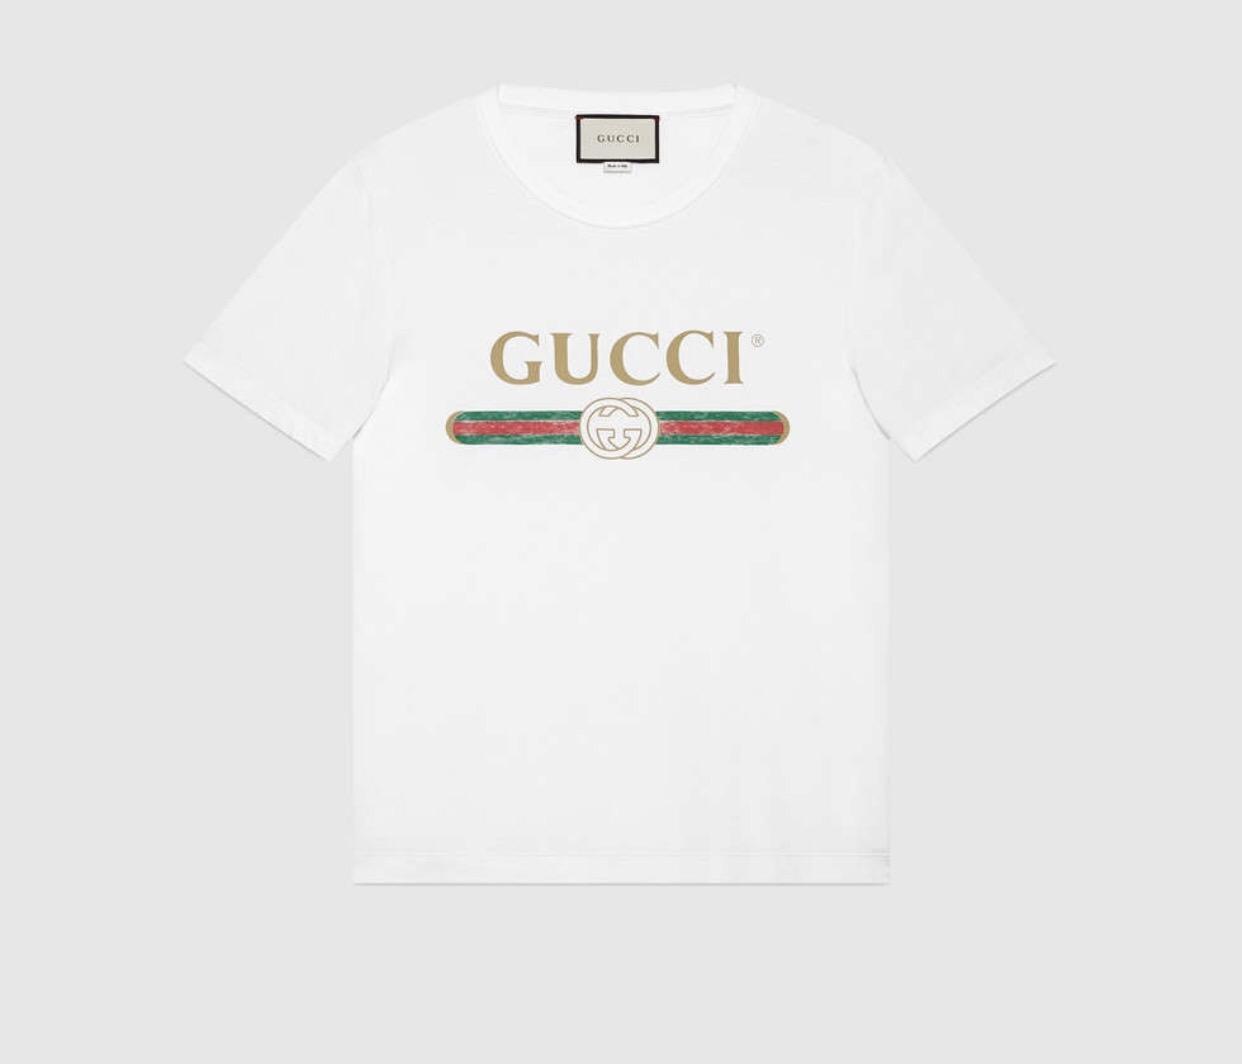 89003facb1fa Vintage Gucci Logo T Shirt Replica - raveitsafe